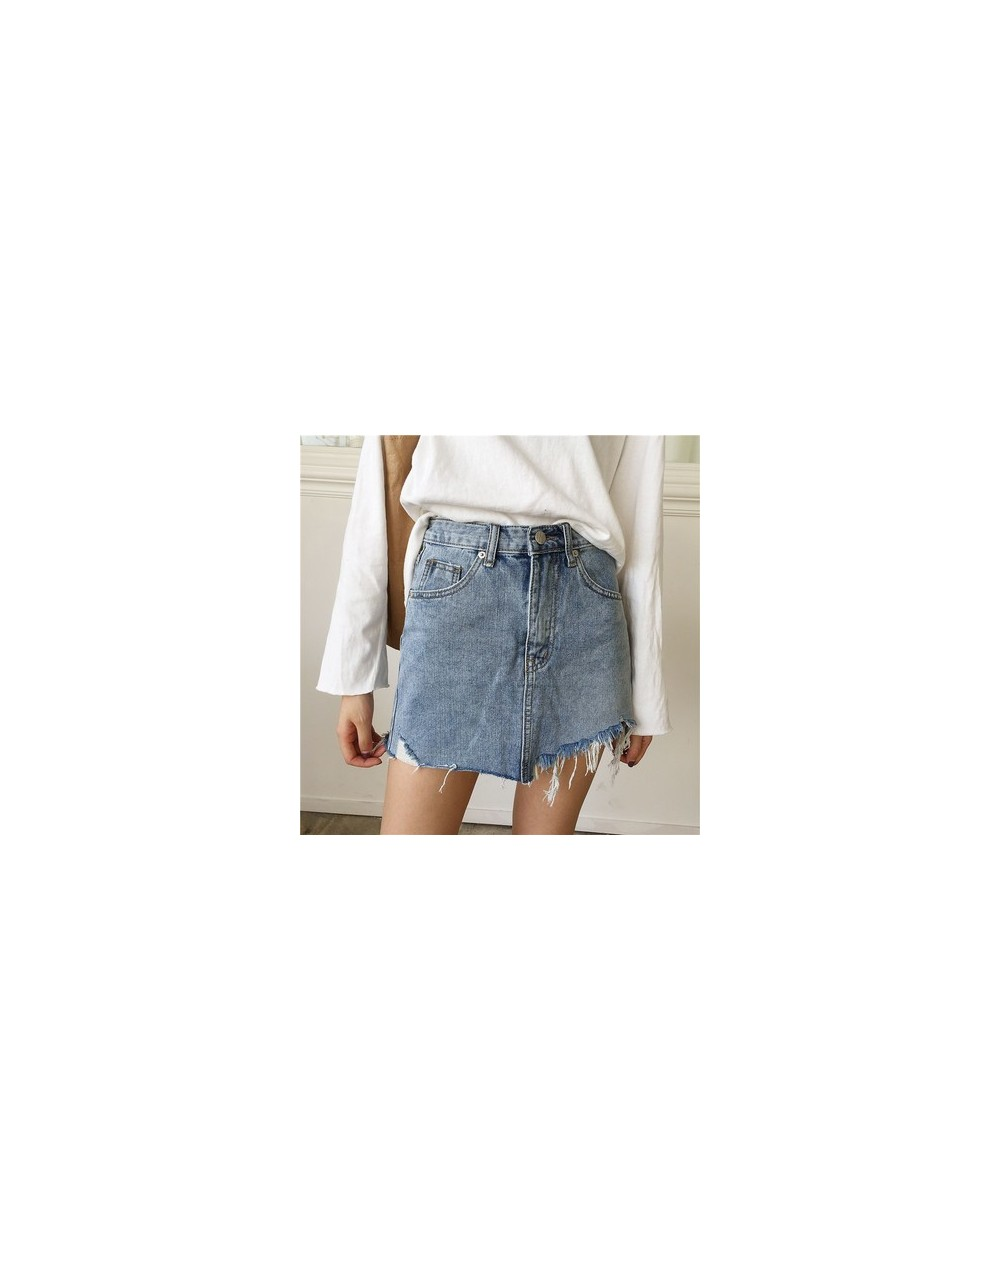 Summer Jeans Skirt Women Irregular Brushed Hem Denim High Waist Skirts Female Vintage Casual Washed Pencil Mini Skirt - Blue...